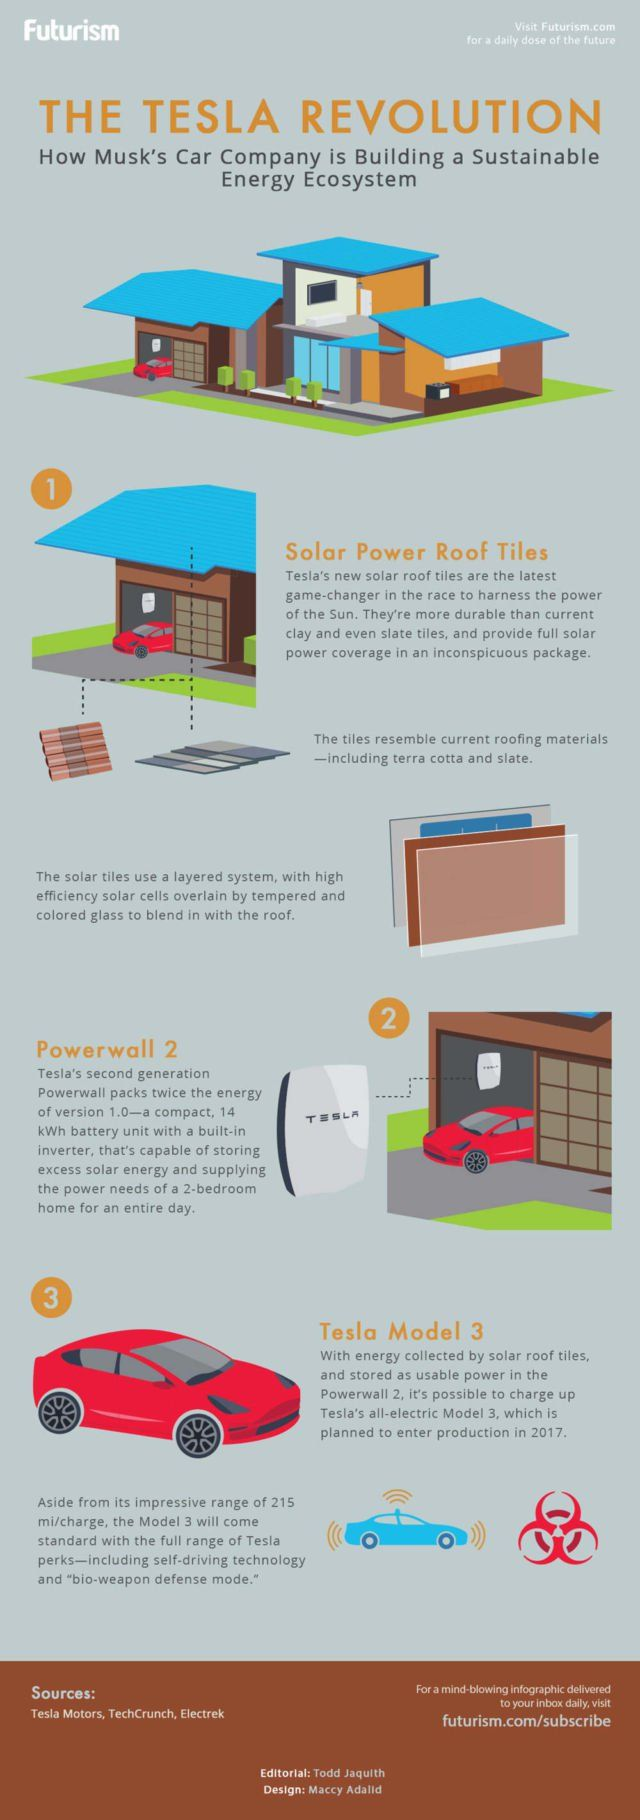 The Tesla Energy Ecosystem- infographic